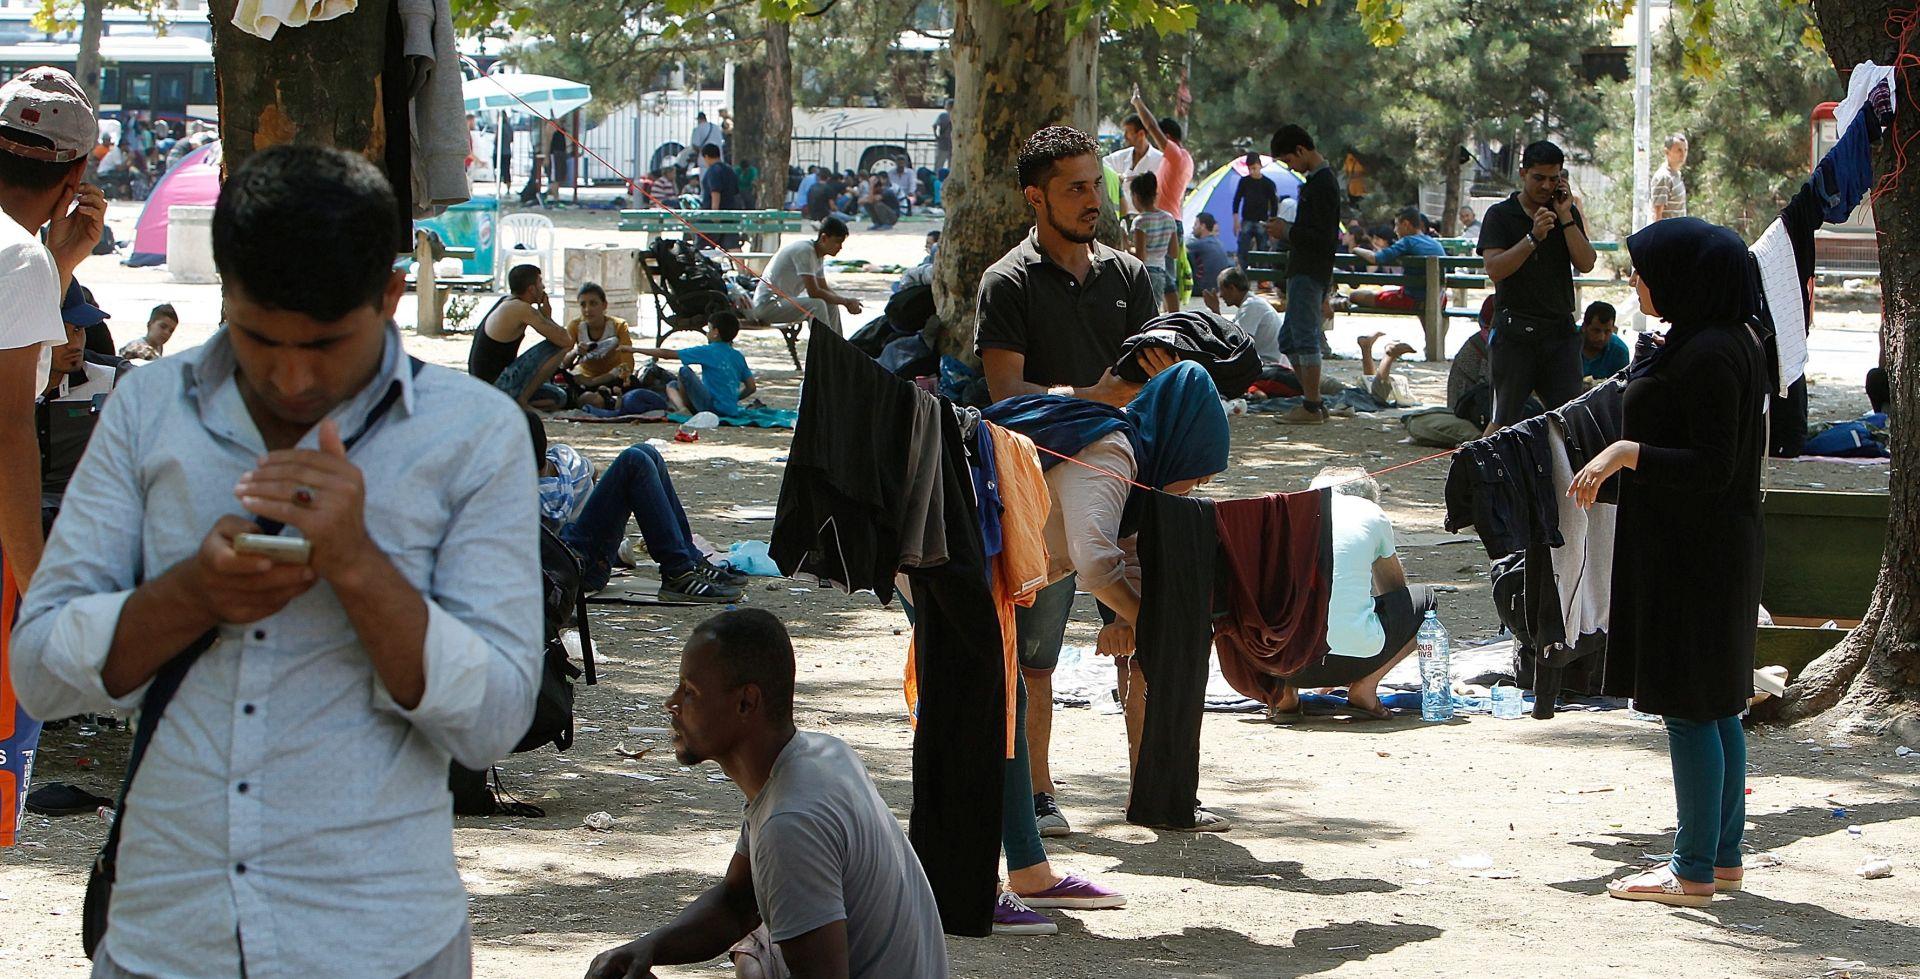 SIGURNOST GRANICA: Australski ministar upozorava na neobrazovane izbjeglice